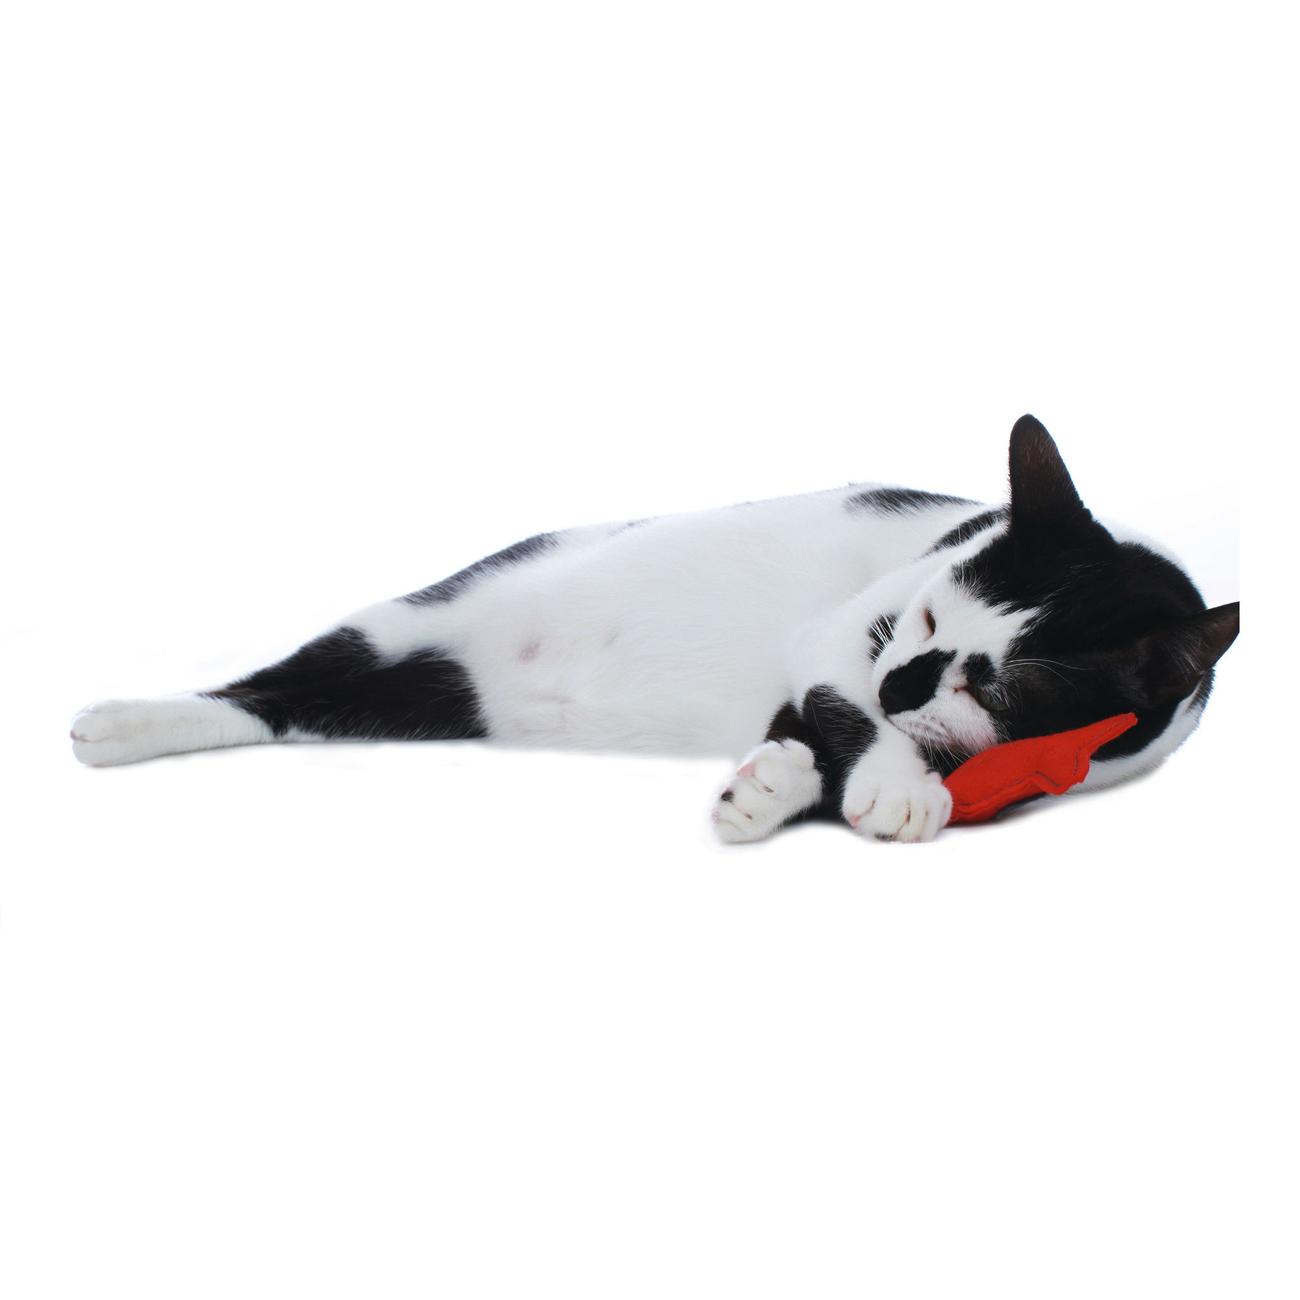 Hunter Katzenspielzeug by Laura 65902, Bild 3